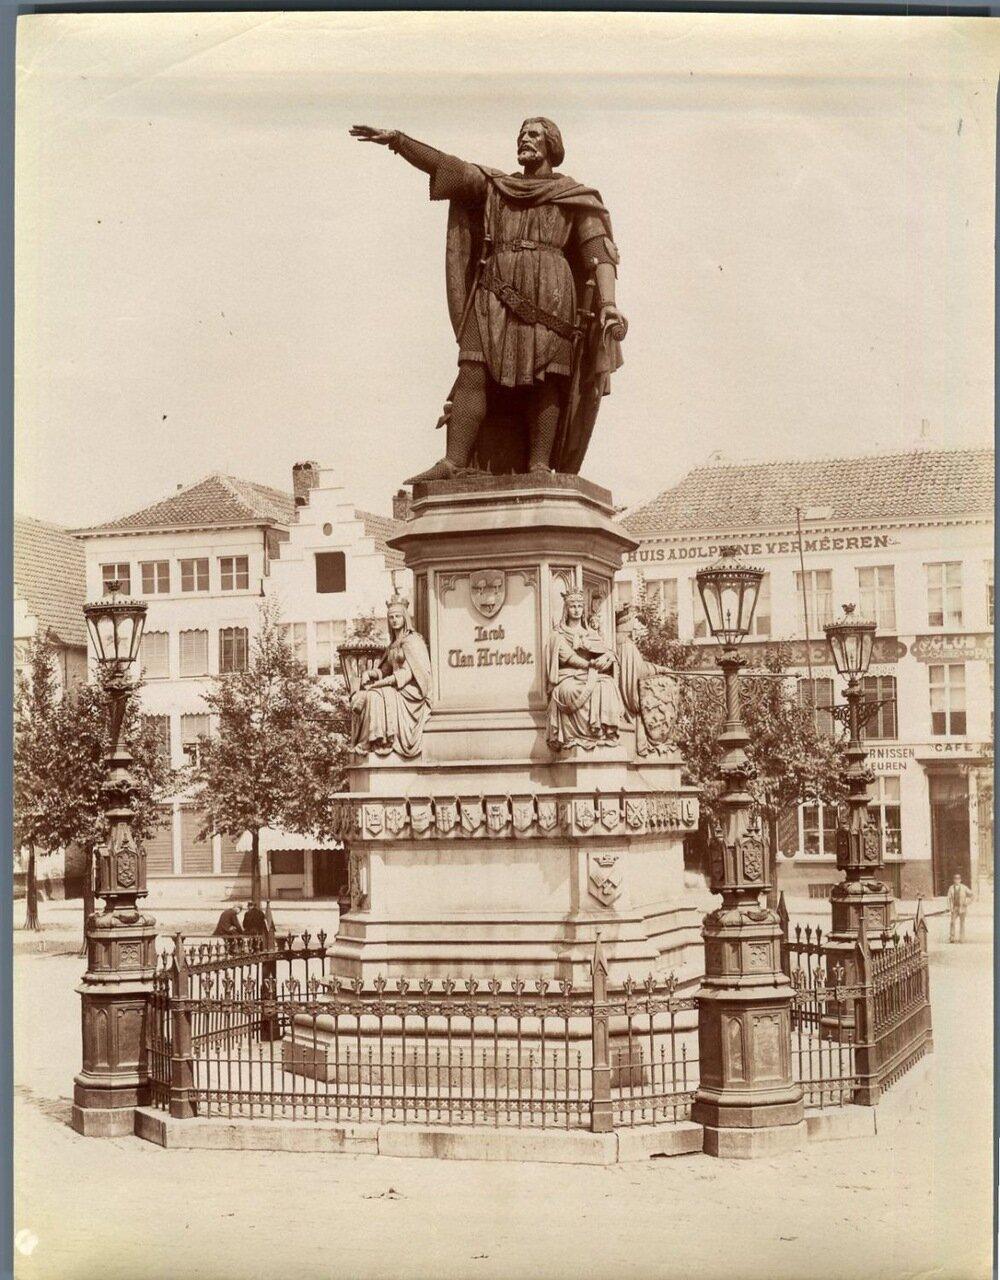 Гент. Статуя Якоба ван Артевельде